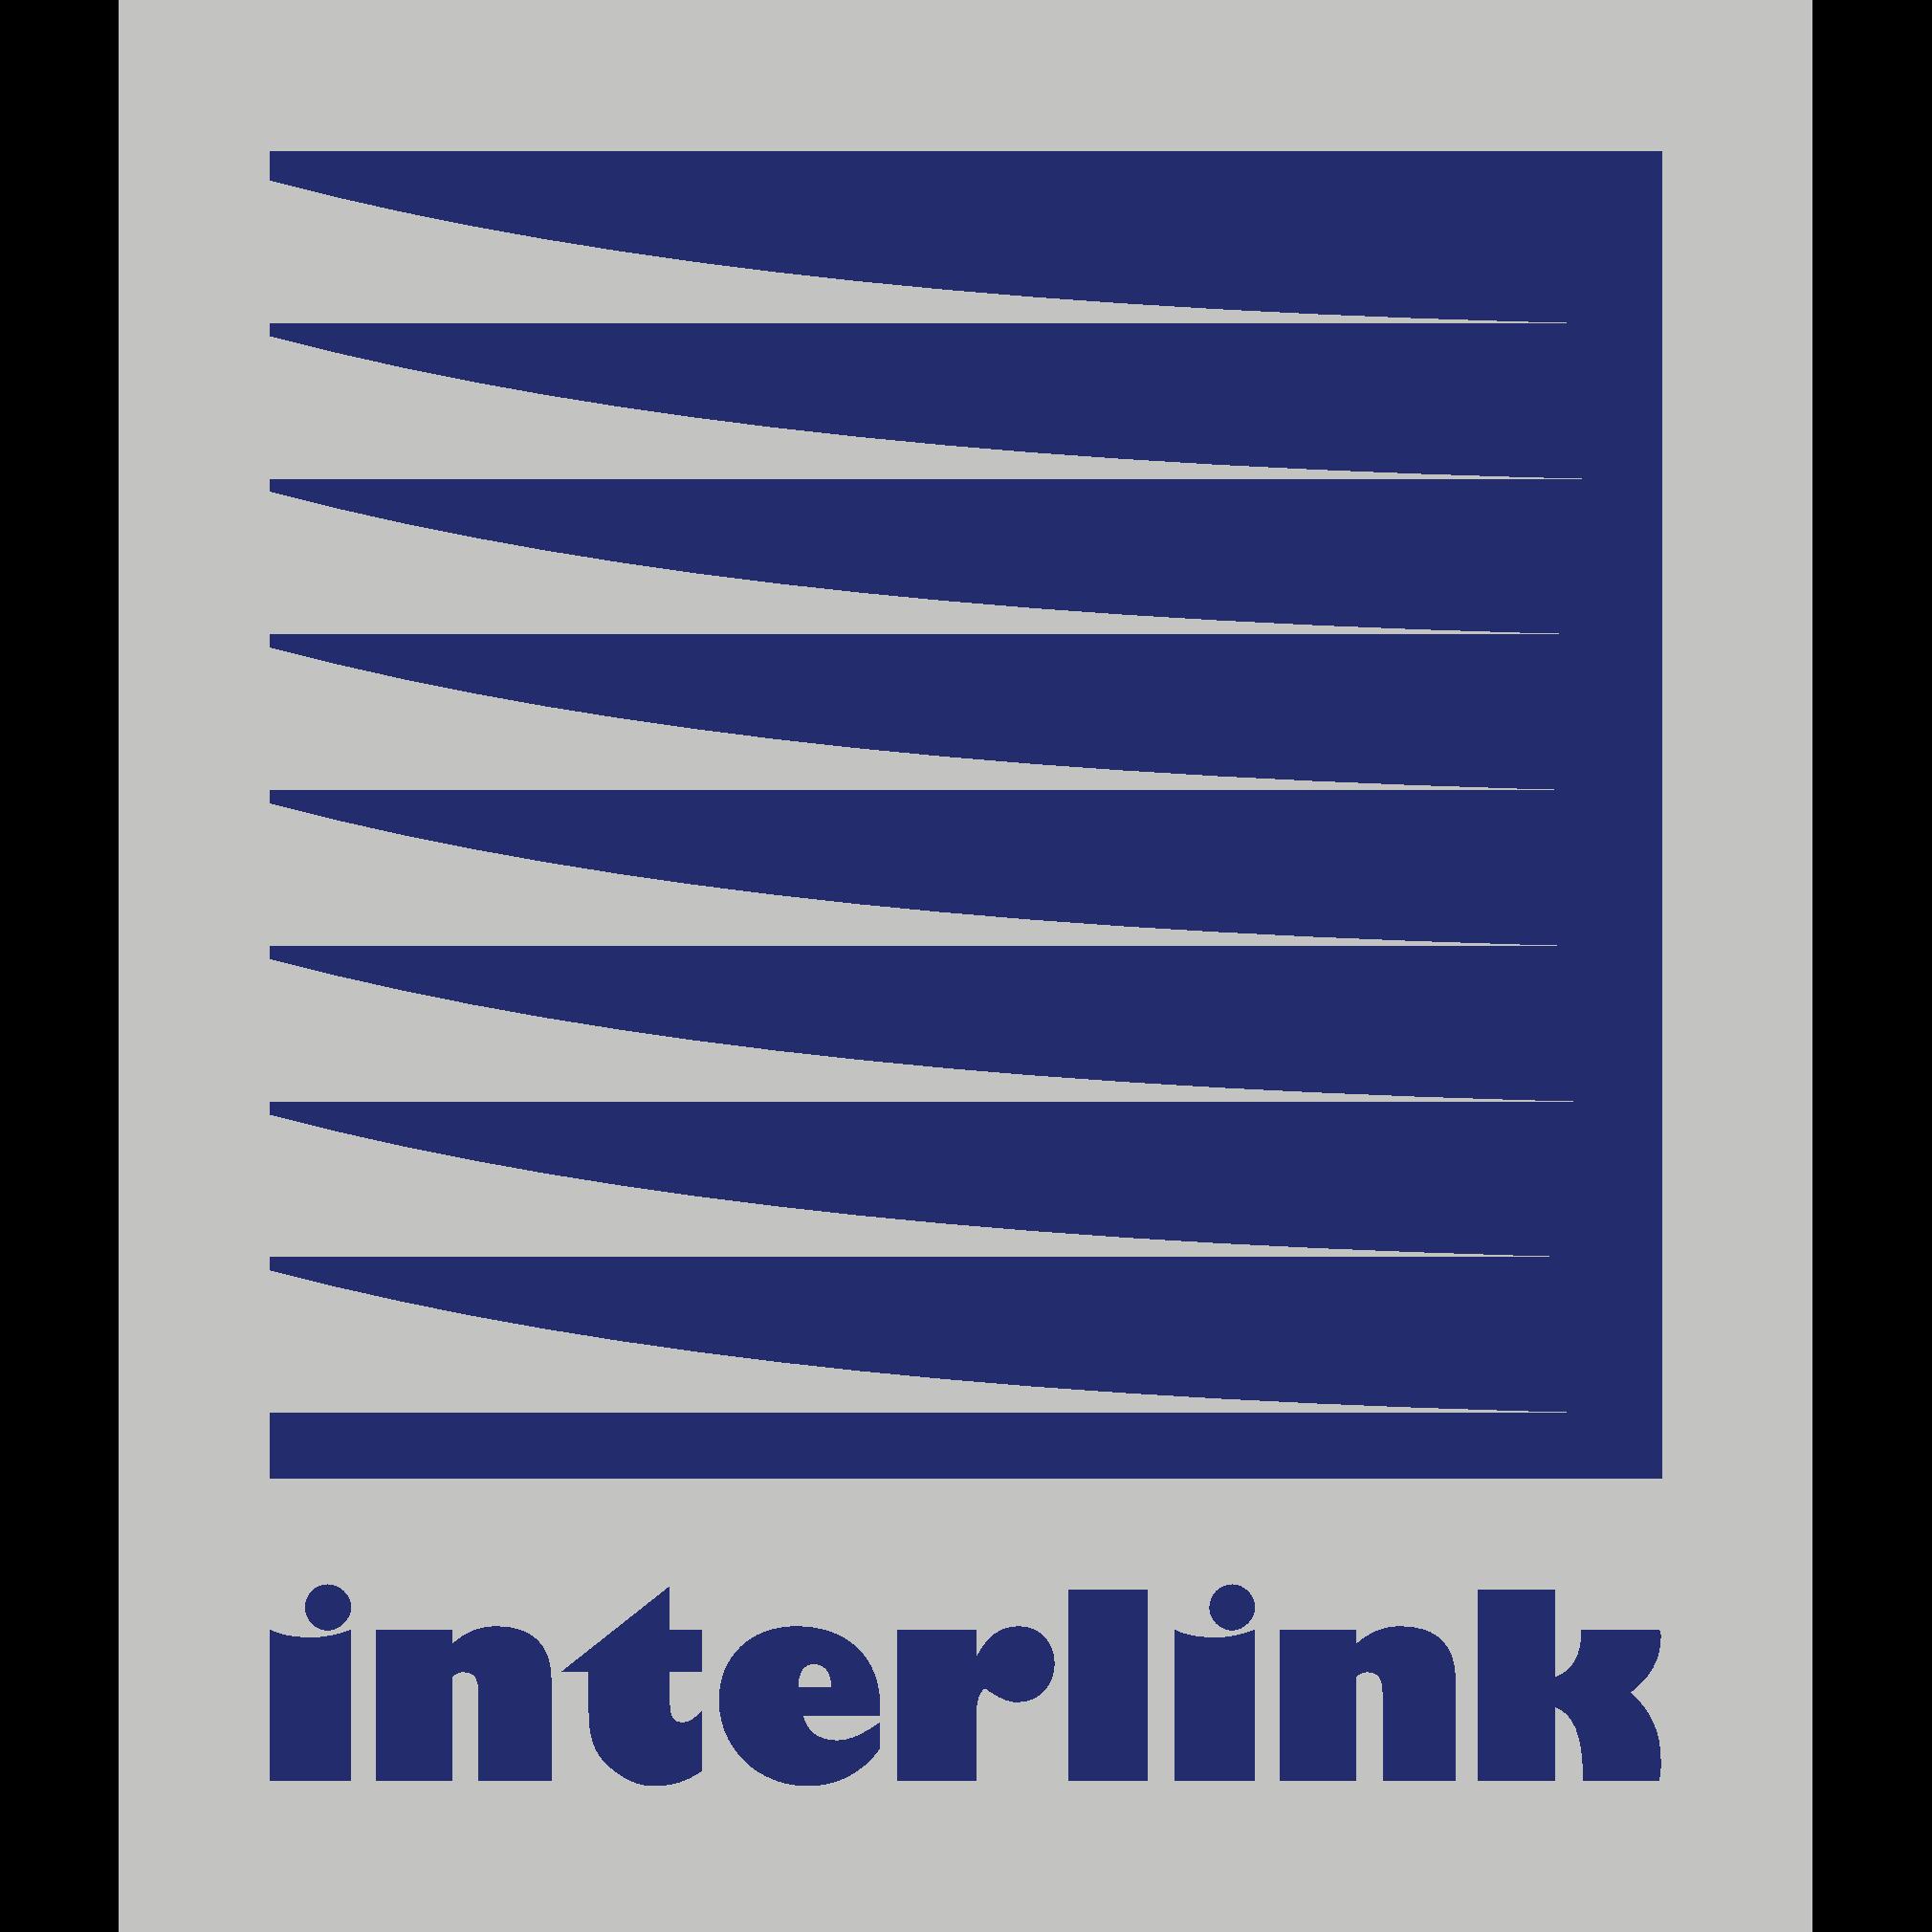 Interlink, s.r.o.